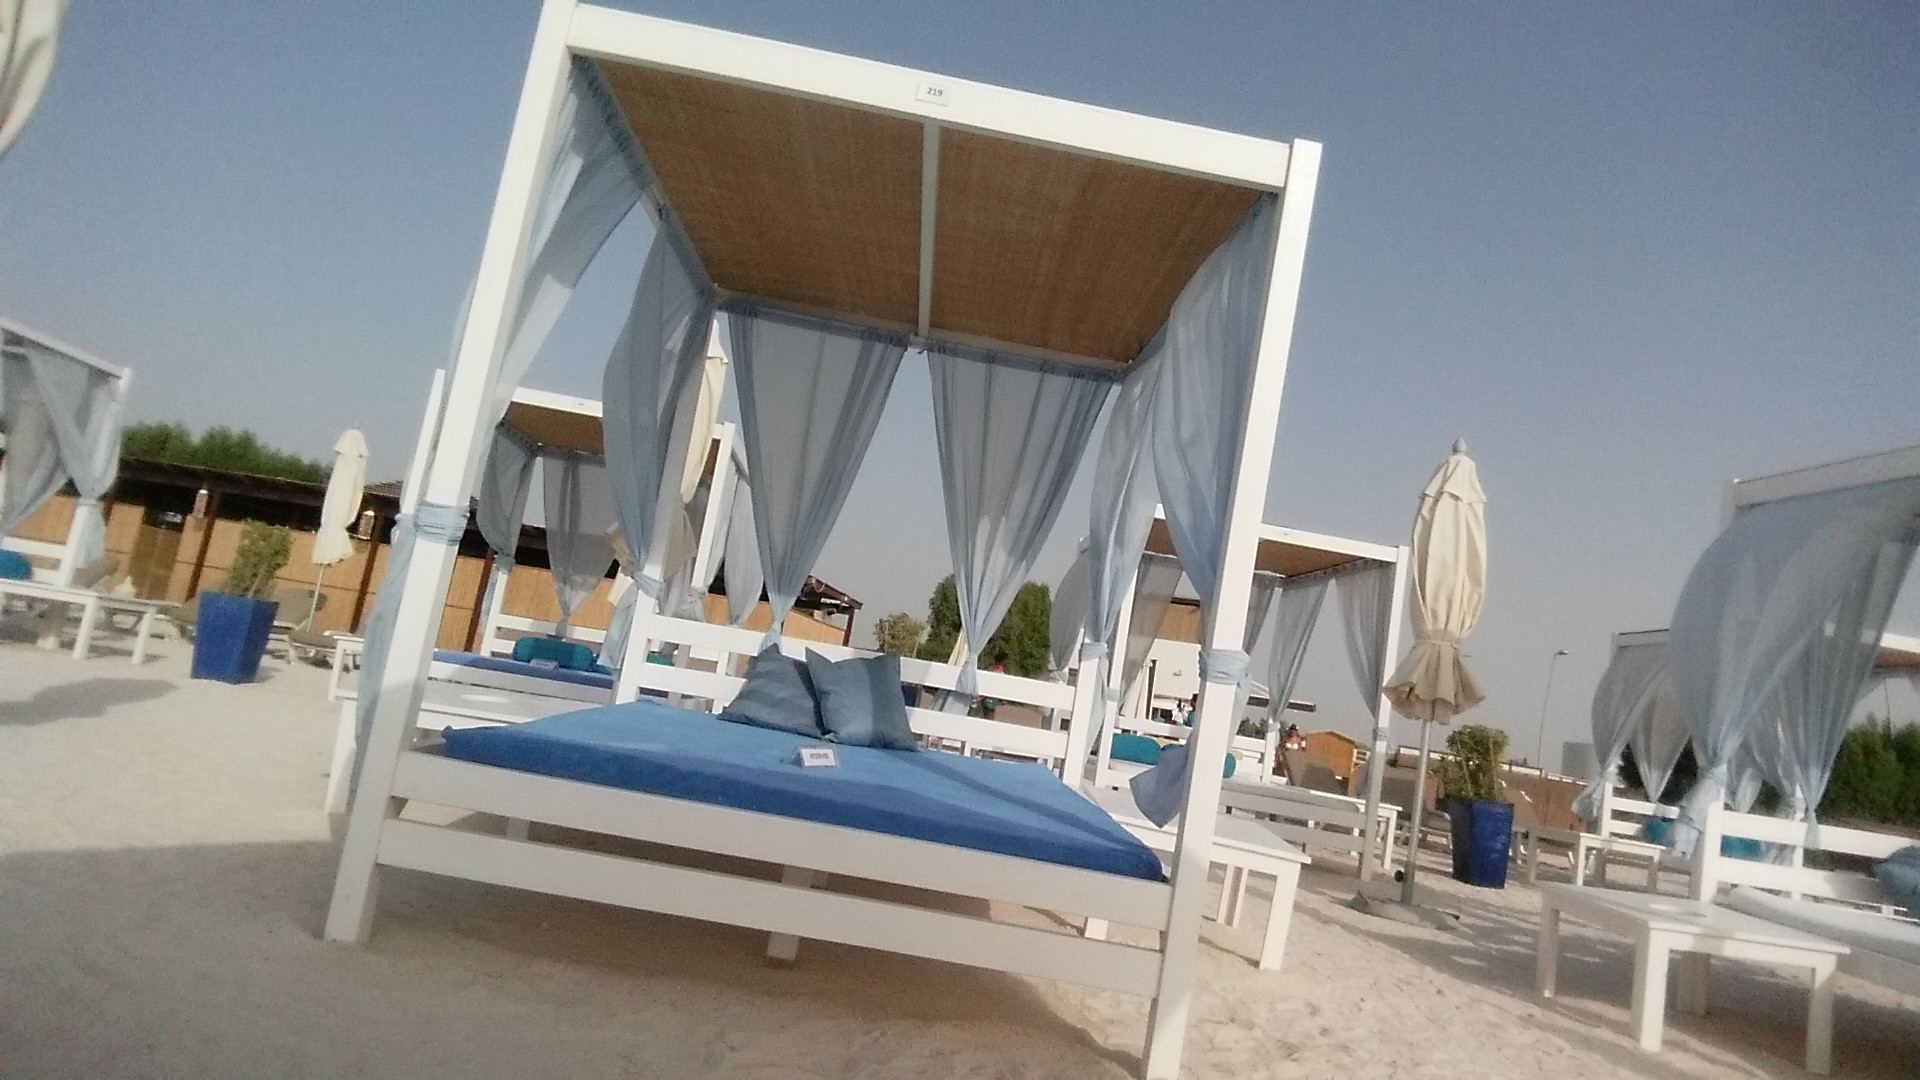 Yas Beach cabana